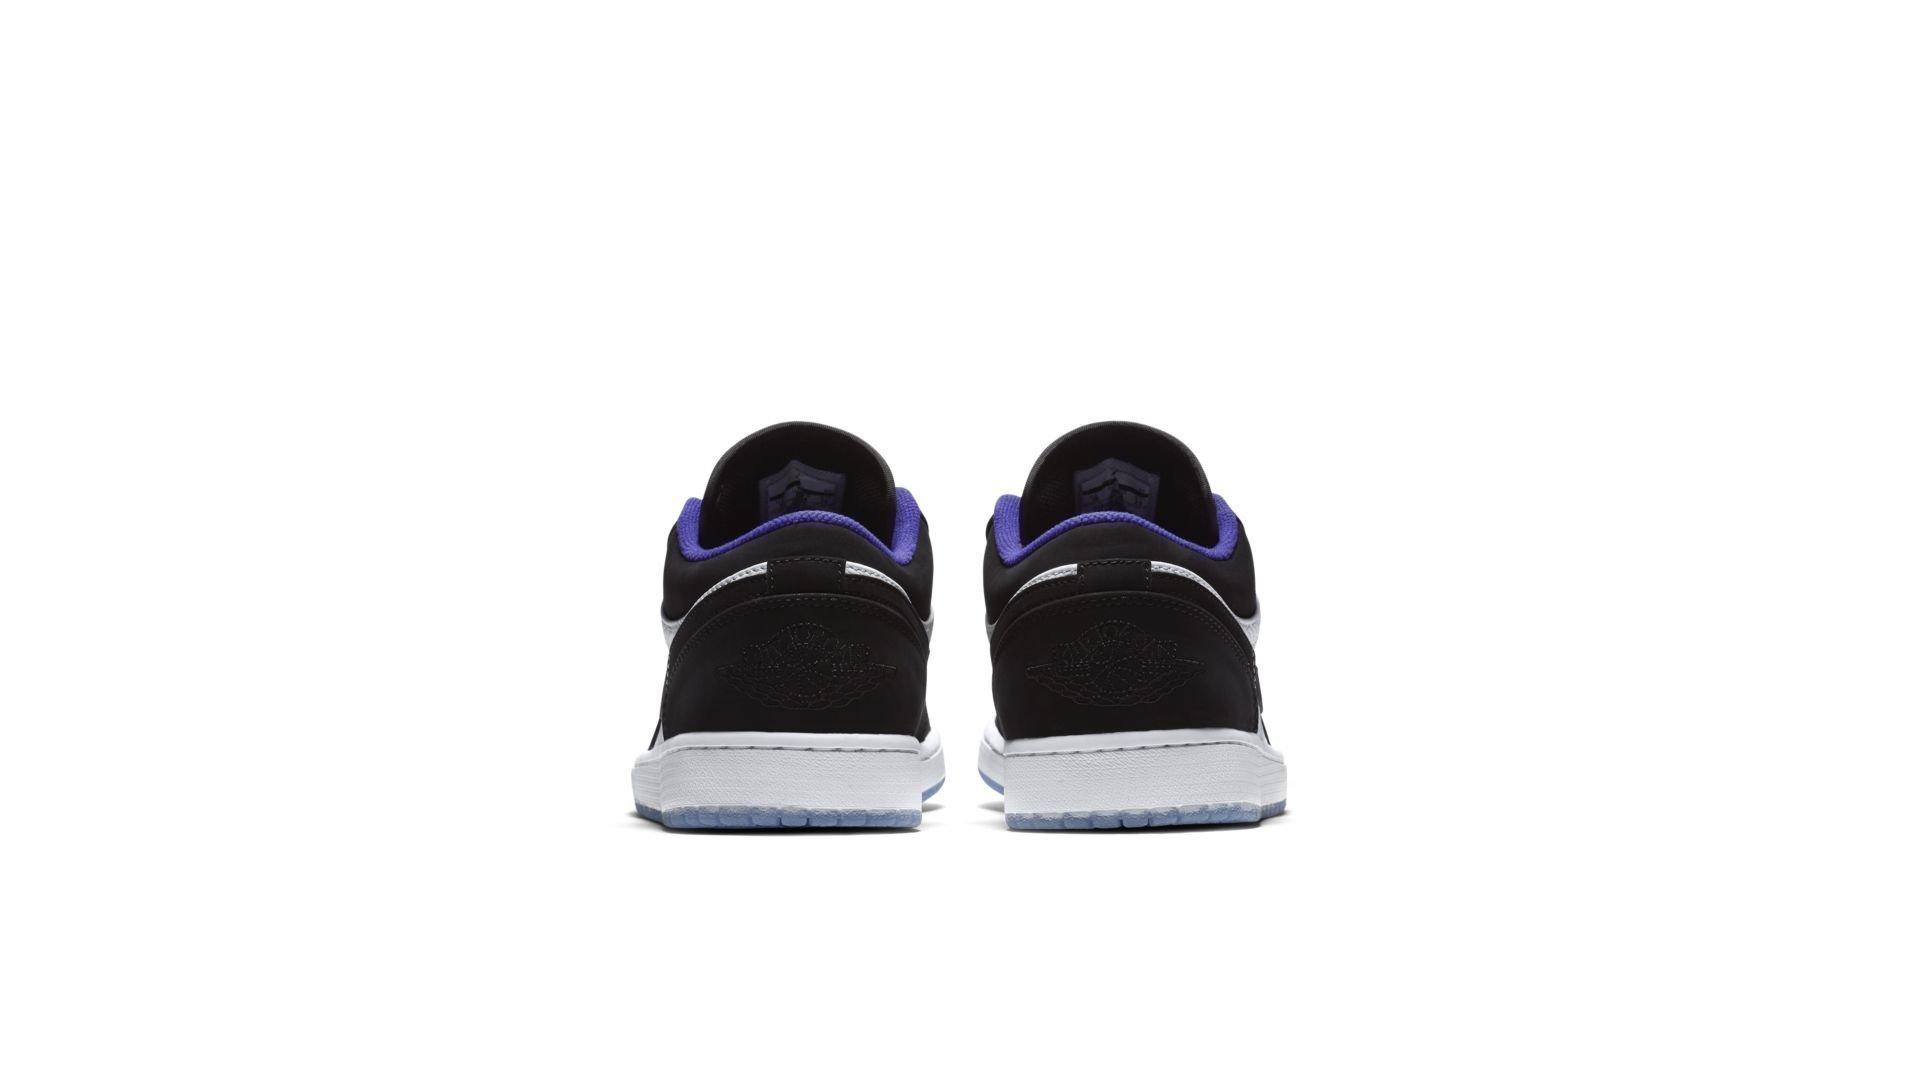 Jordan 1 Low Concord (553558-108)